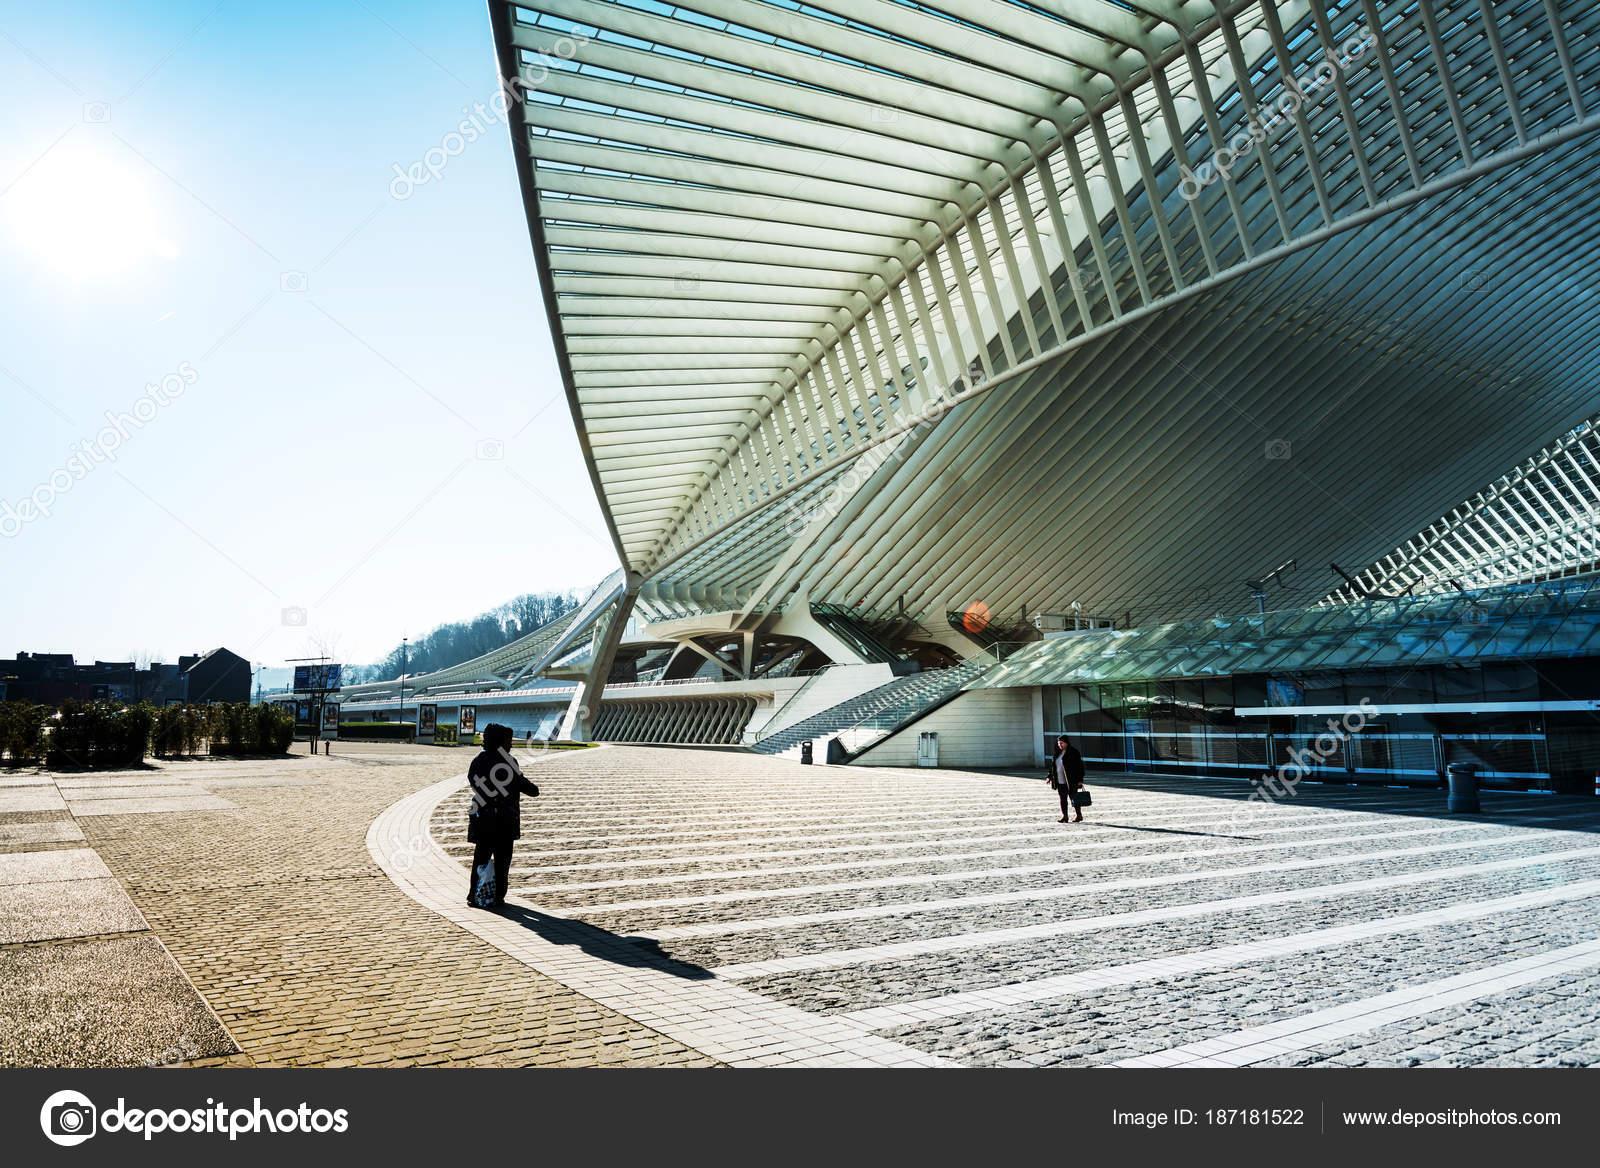 Berühmte Architektur lüttich belgien februar 2018 berühmte architektur bahnhof liège